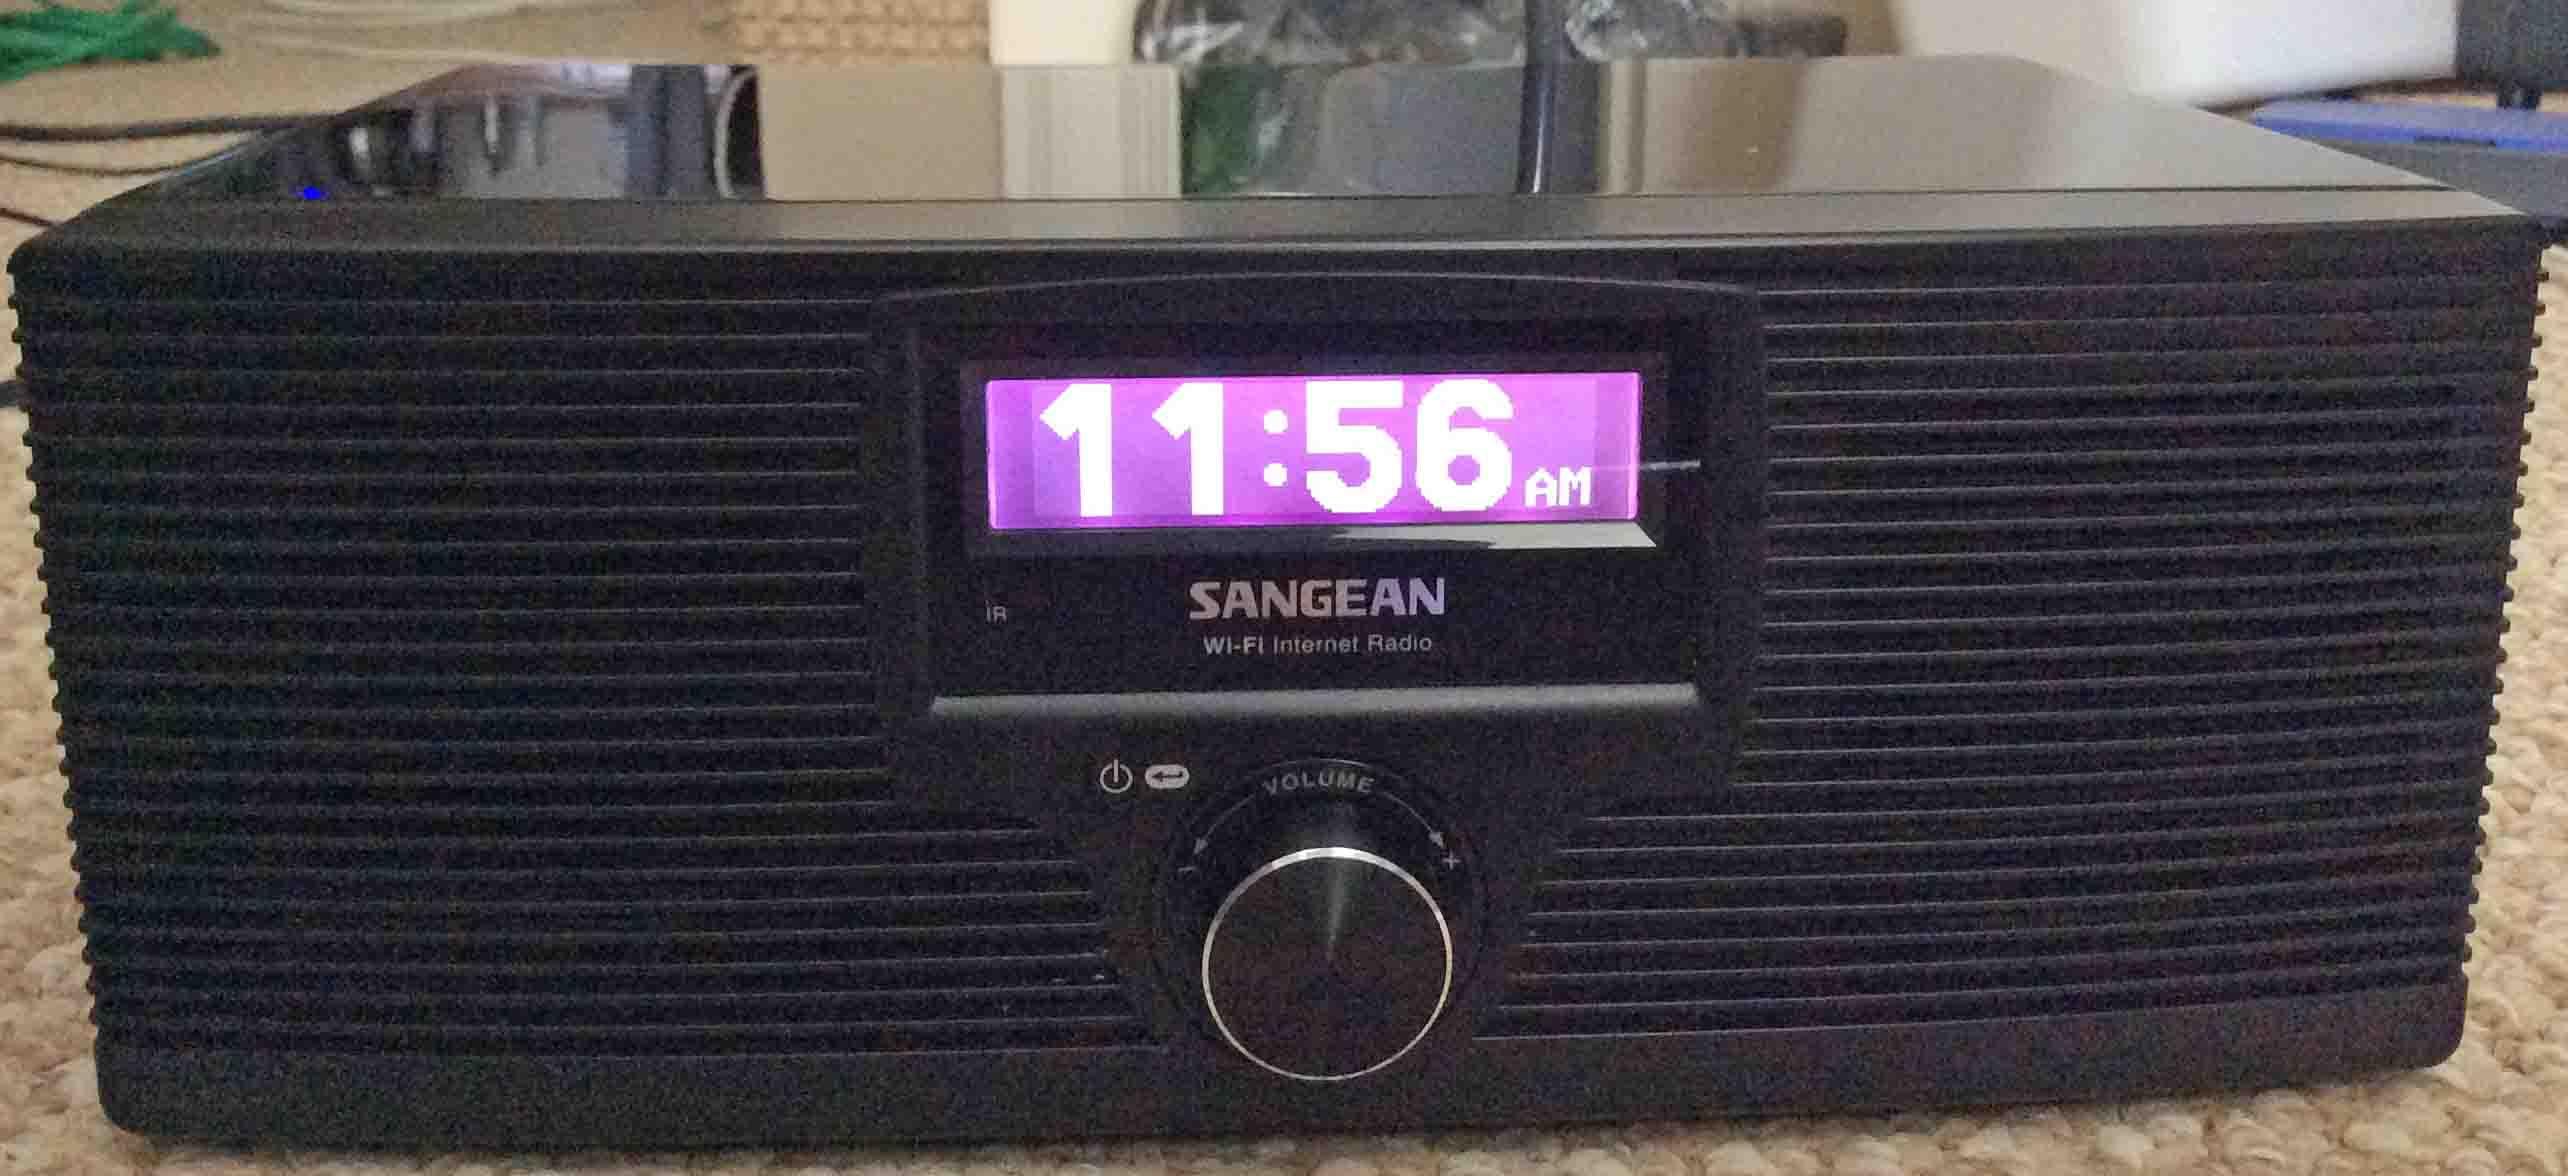 sangean wfr 20 digital wifi internet radio player review tom s tek rh tomstek us Sangean Radios Best Deal Sangean CC Radio